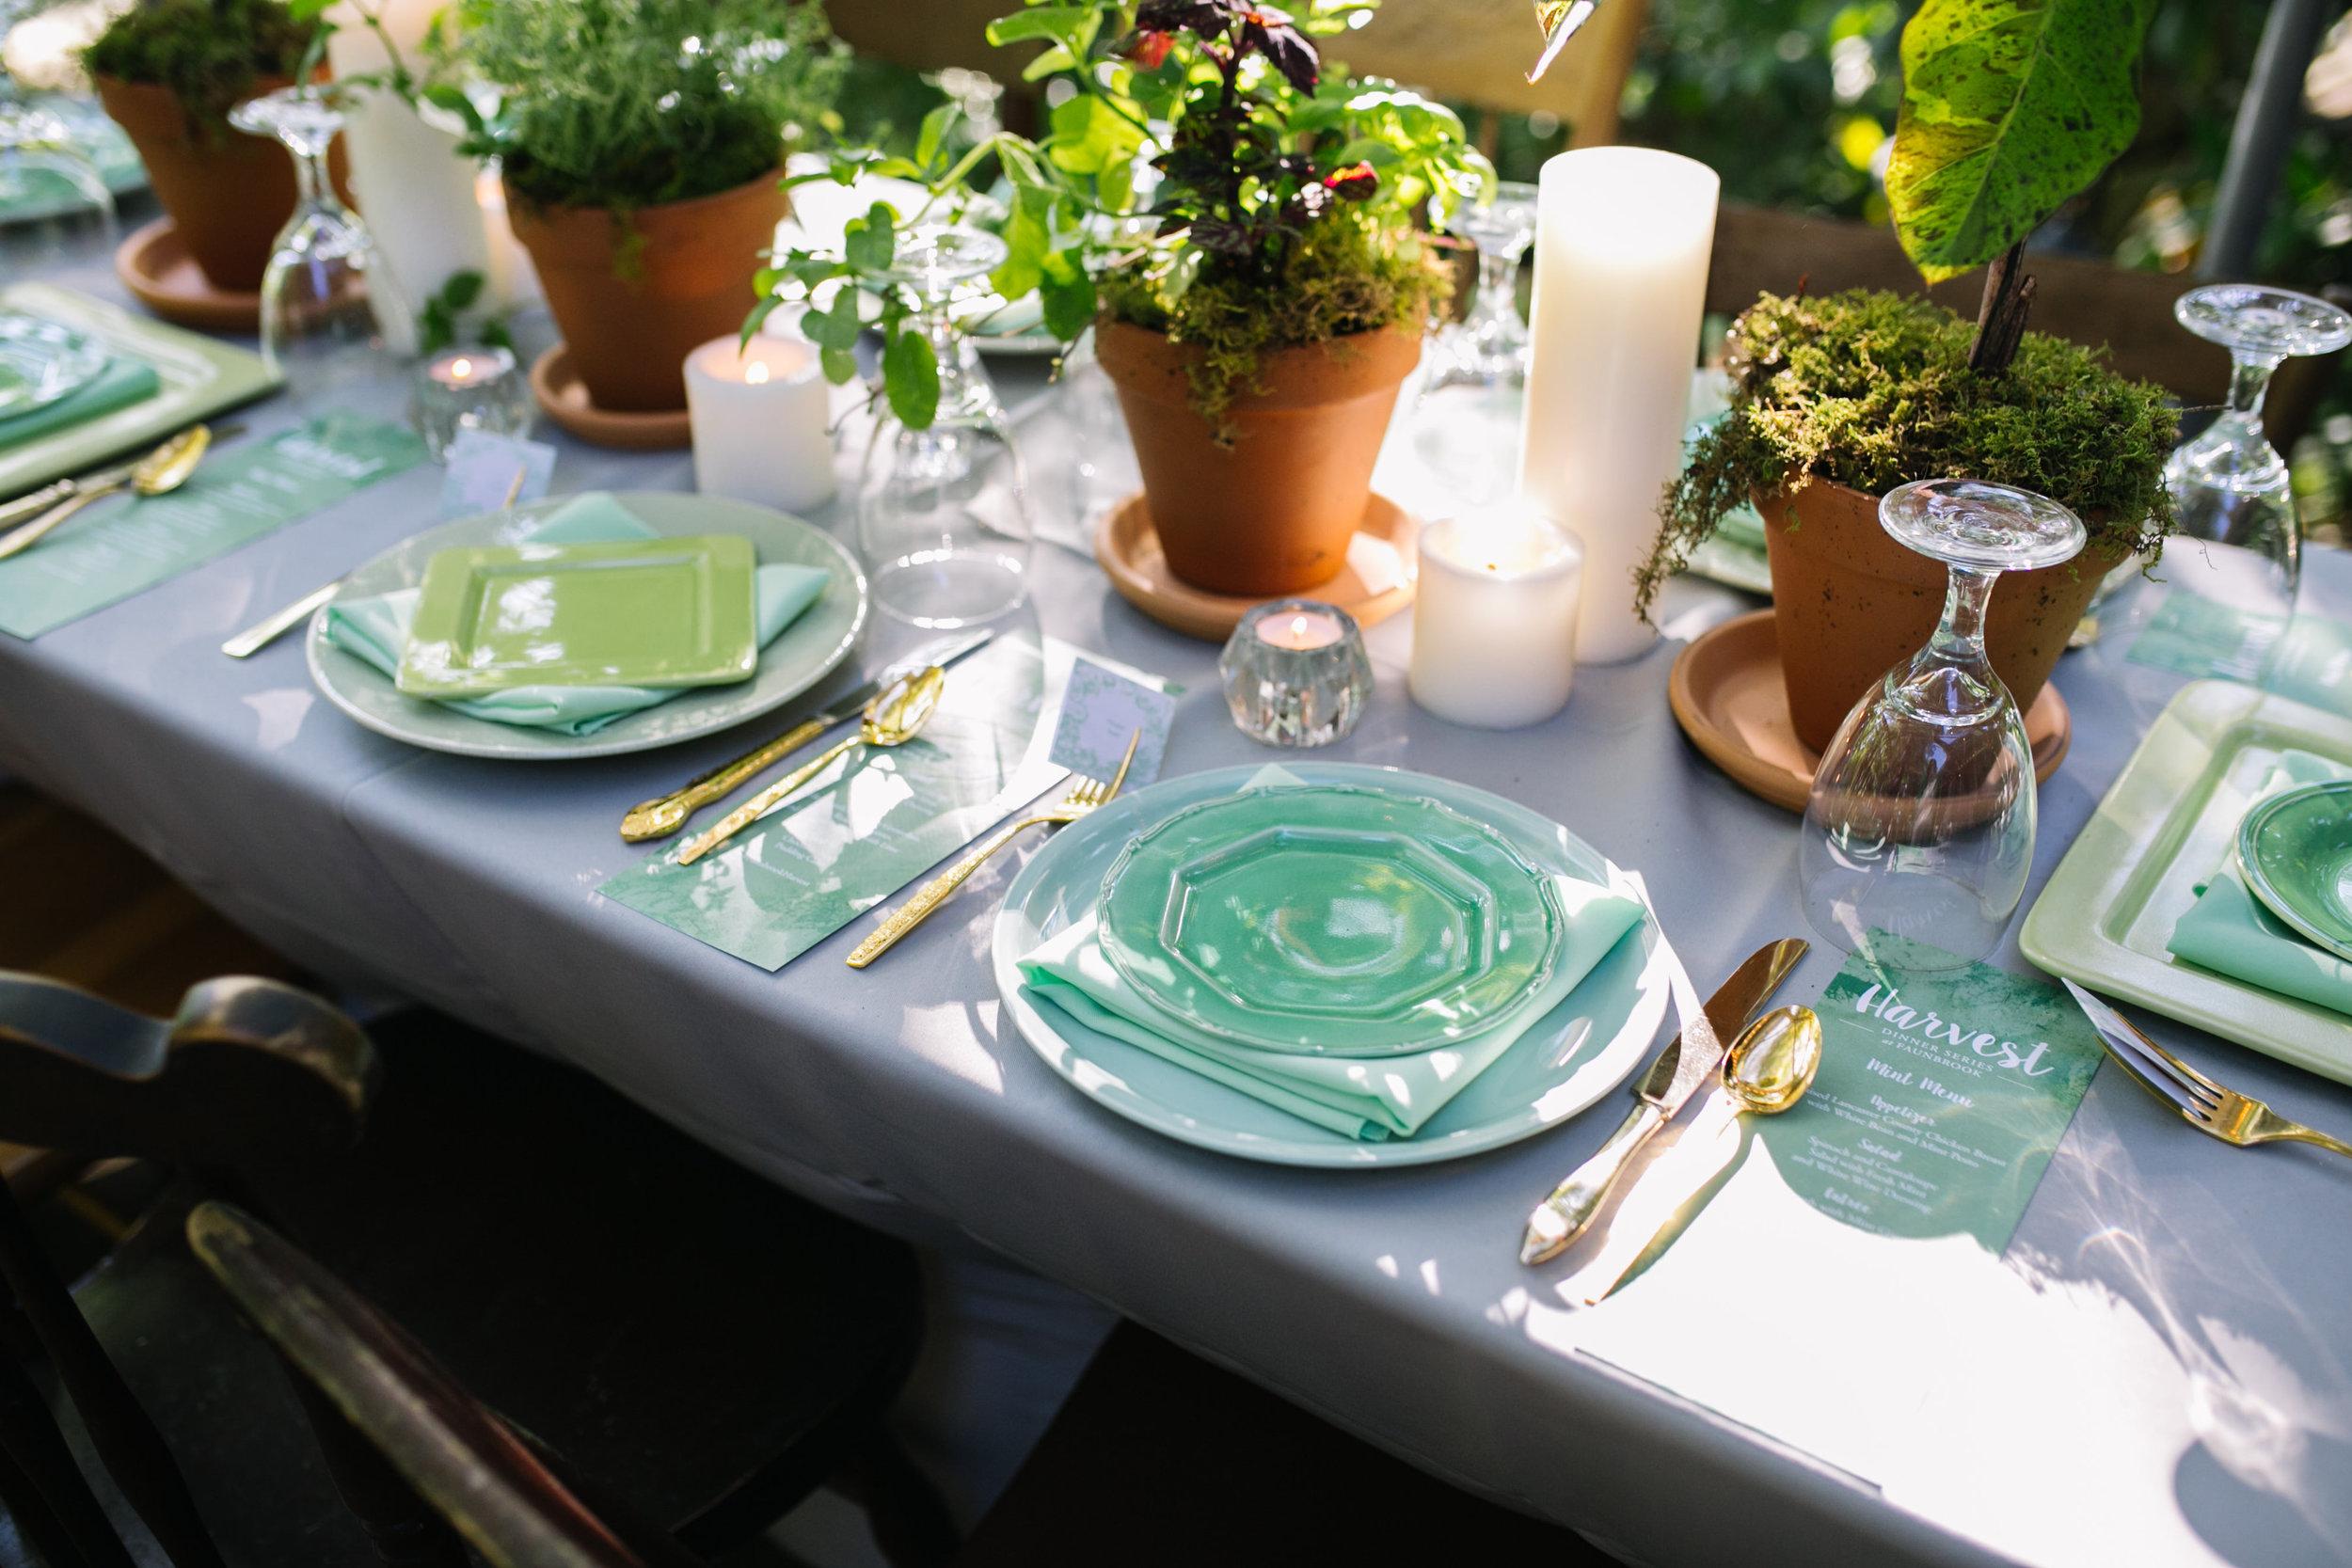 West-Chester-PA-Faunbrook-Harvest-Dinner-Series-Mint-BrittneyRaine-24.JPG